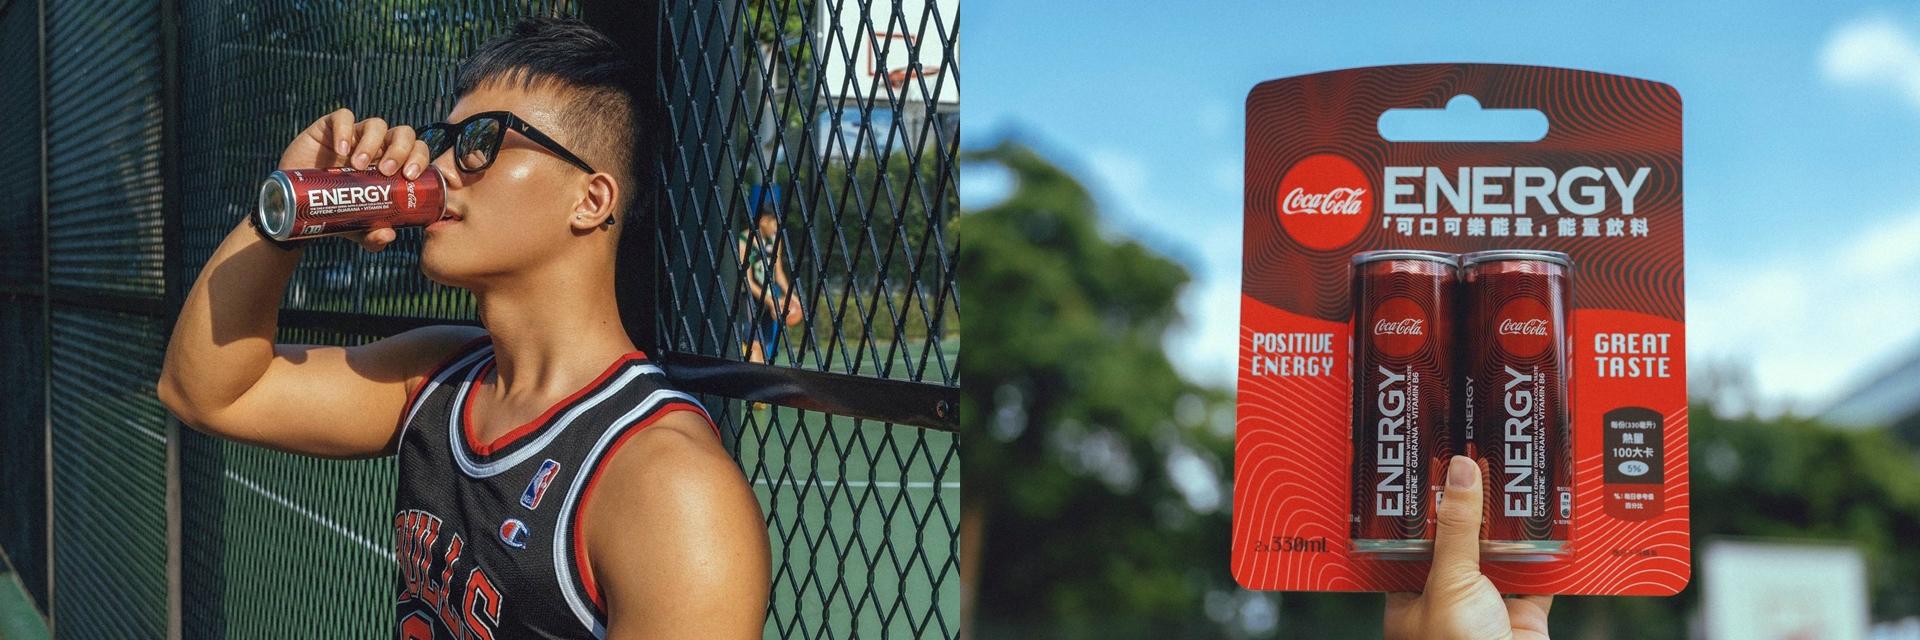 Coca-Cola Energy 全台限量販售中!已受封「最好喝能量飲料」,超炫波紋包裝再掀打卡熱!